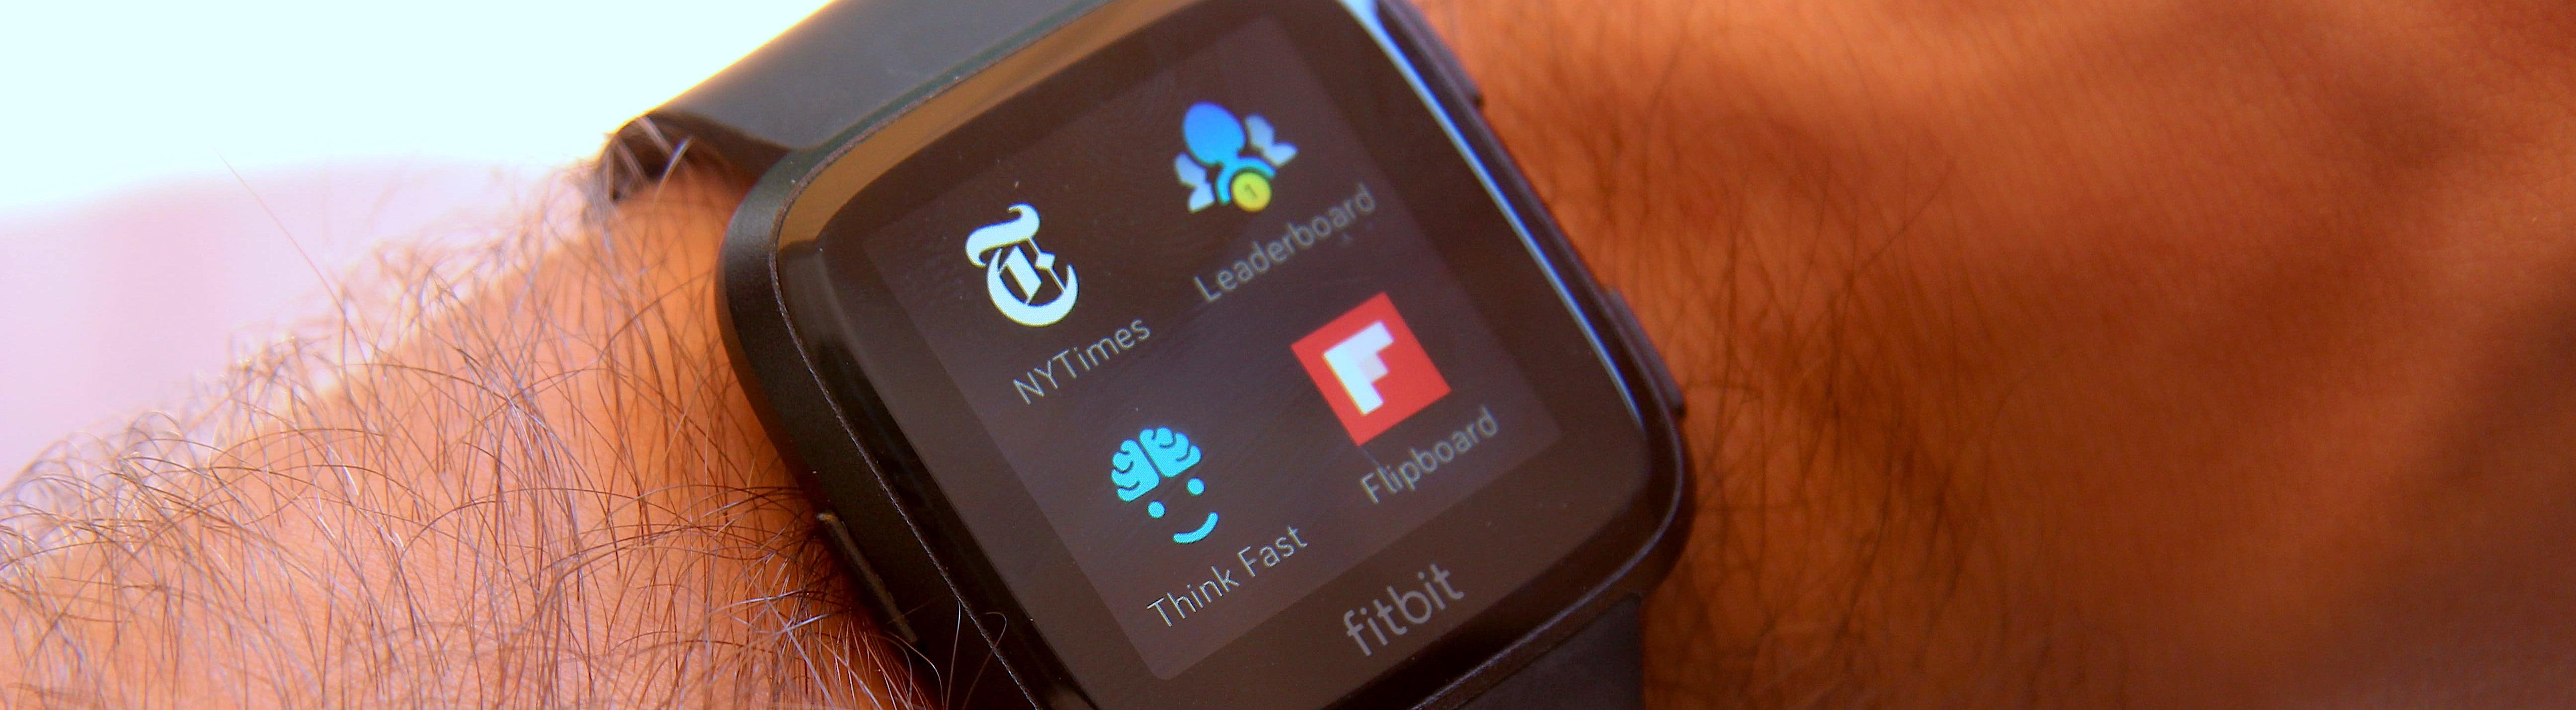 Aplicaciones Fitbit Versa TheNewYorkTimes